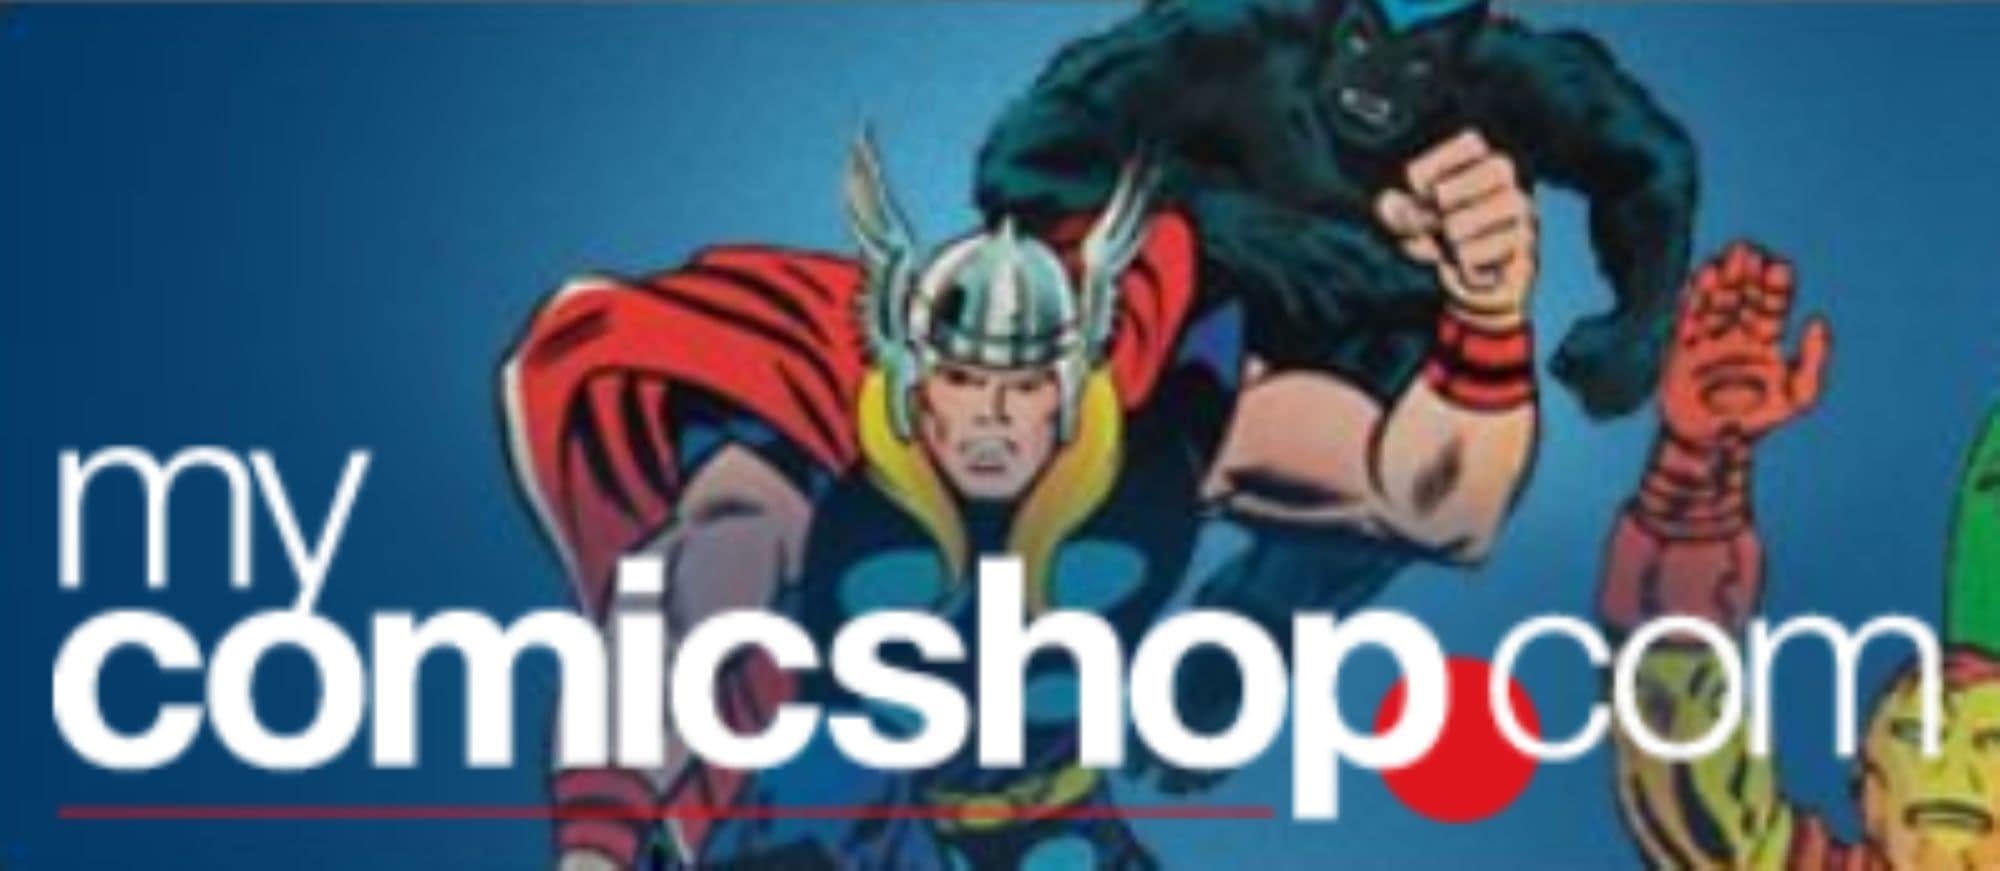 MyComicShop Calls For Boycott Printing Comics in China.